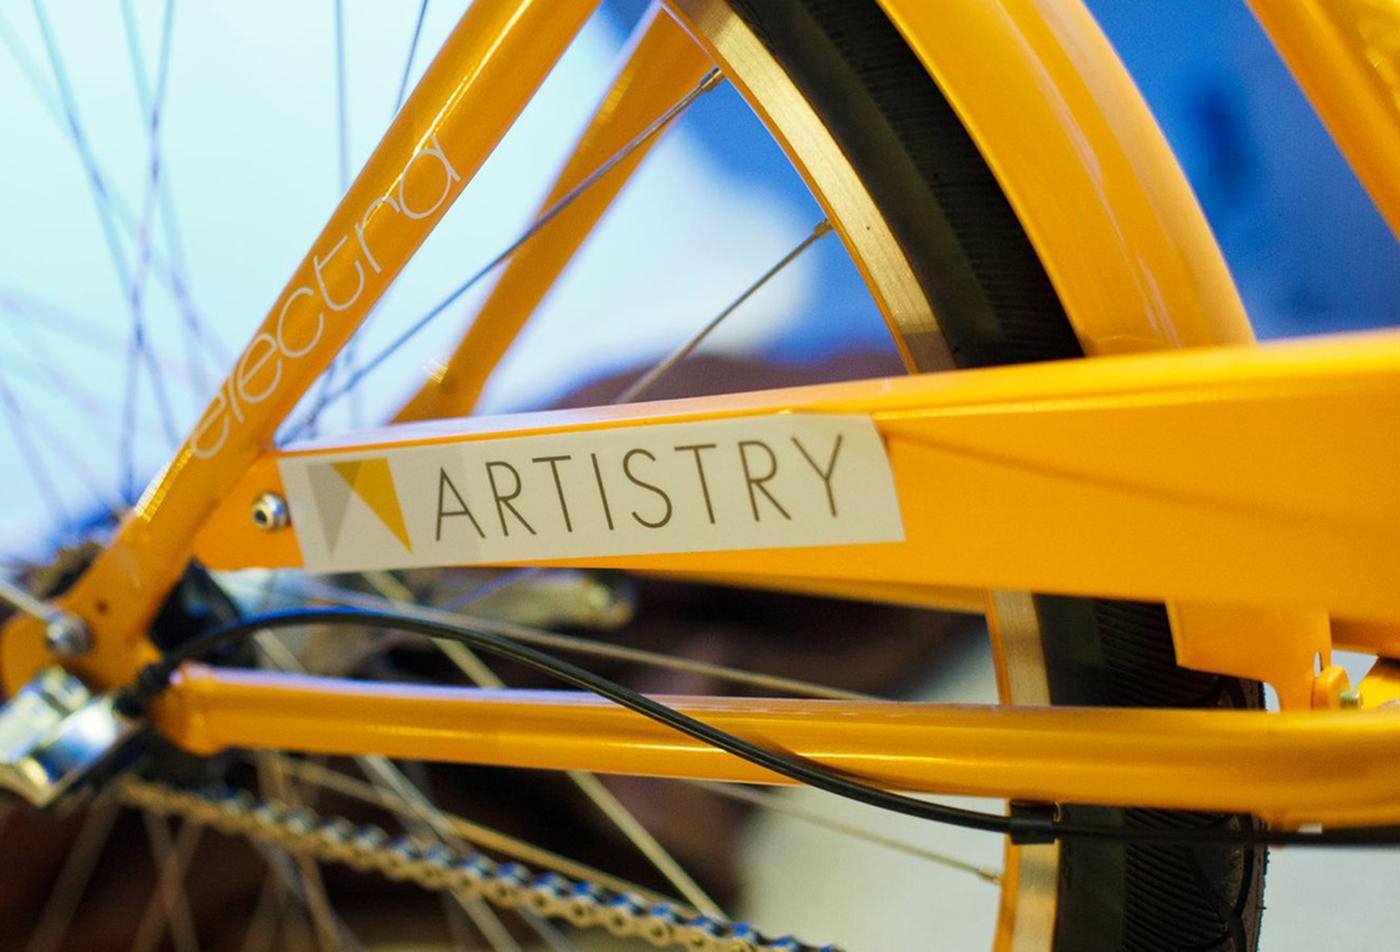 Image of Bike Rental for Artistry